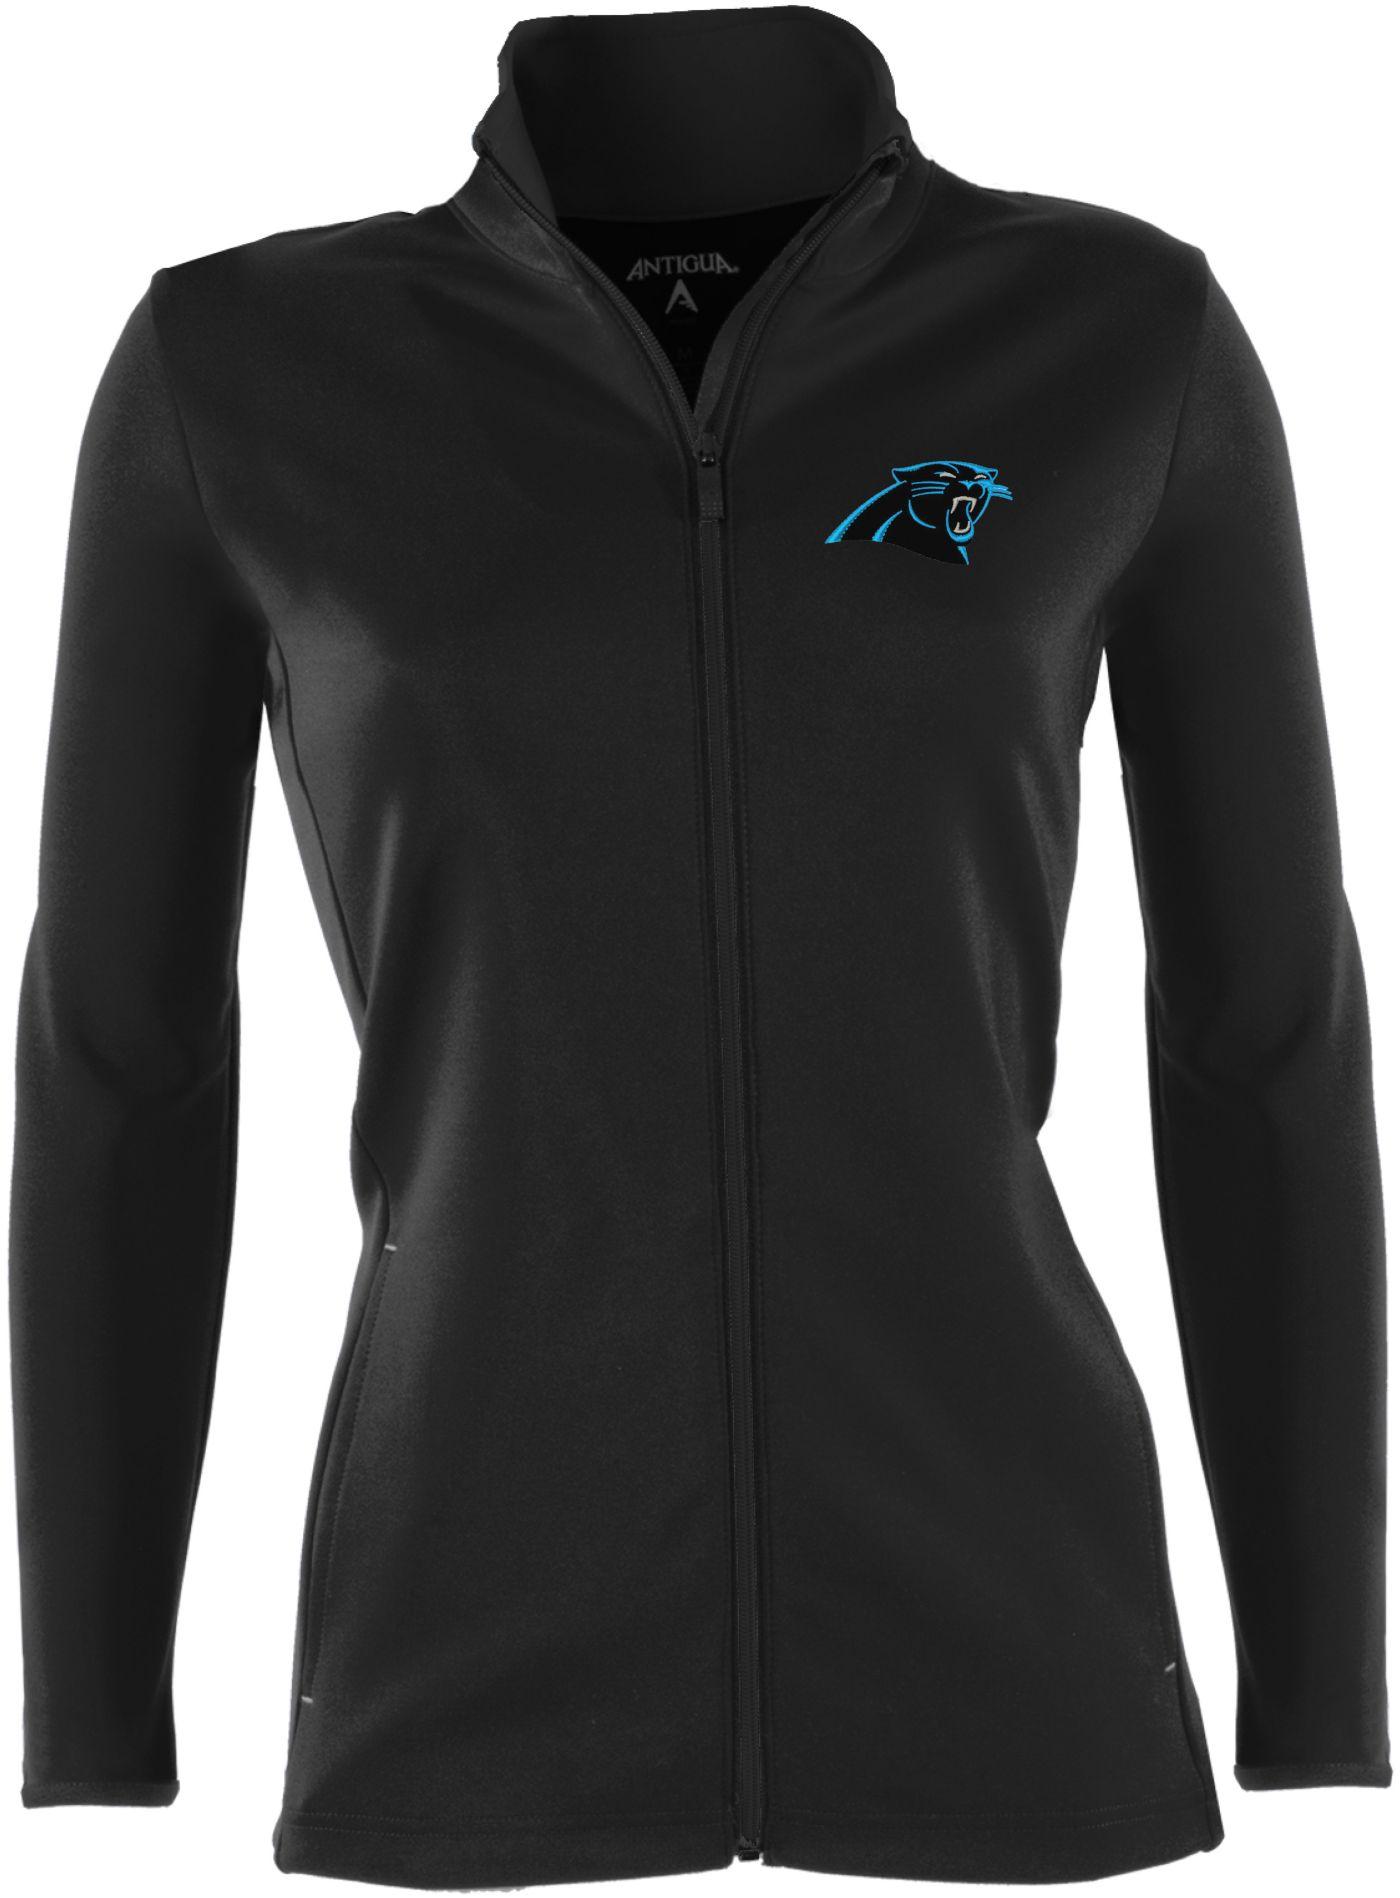 Antigua Women's Carolina Panthers Leader Black Jacket